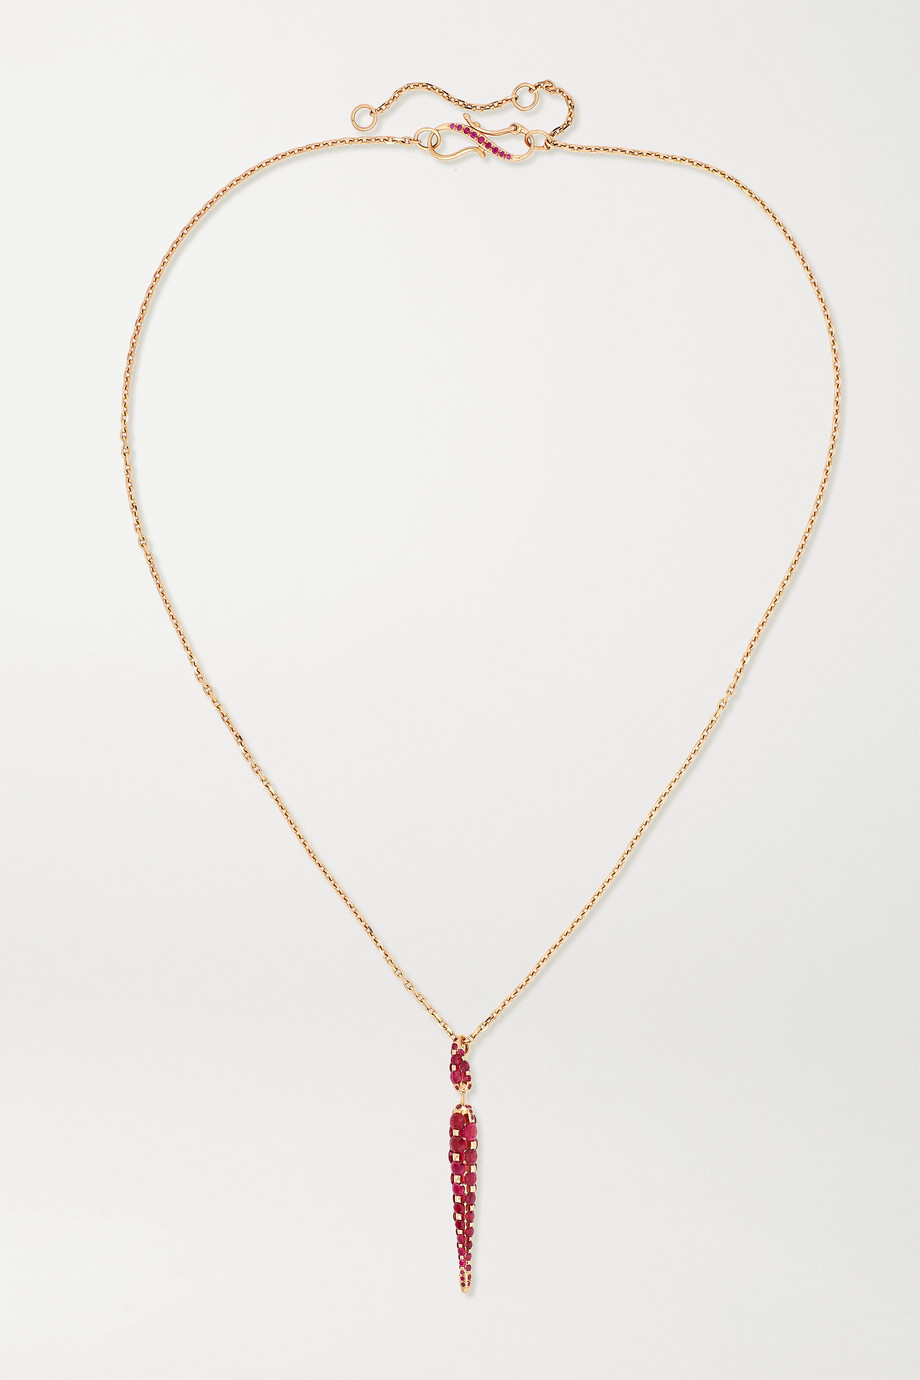 Boghossian Merveilles Icicle 18-karat rose gold ruby necklace